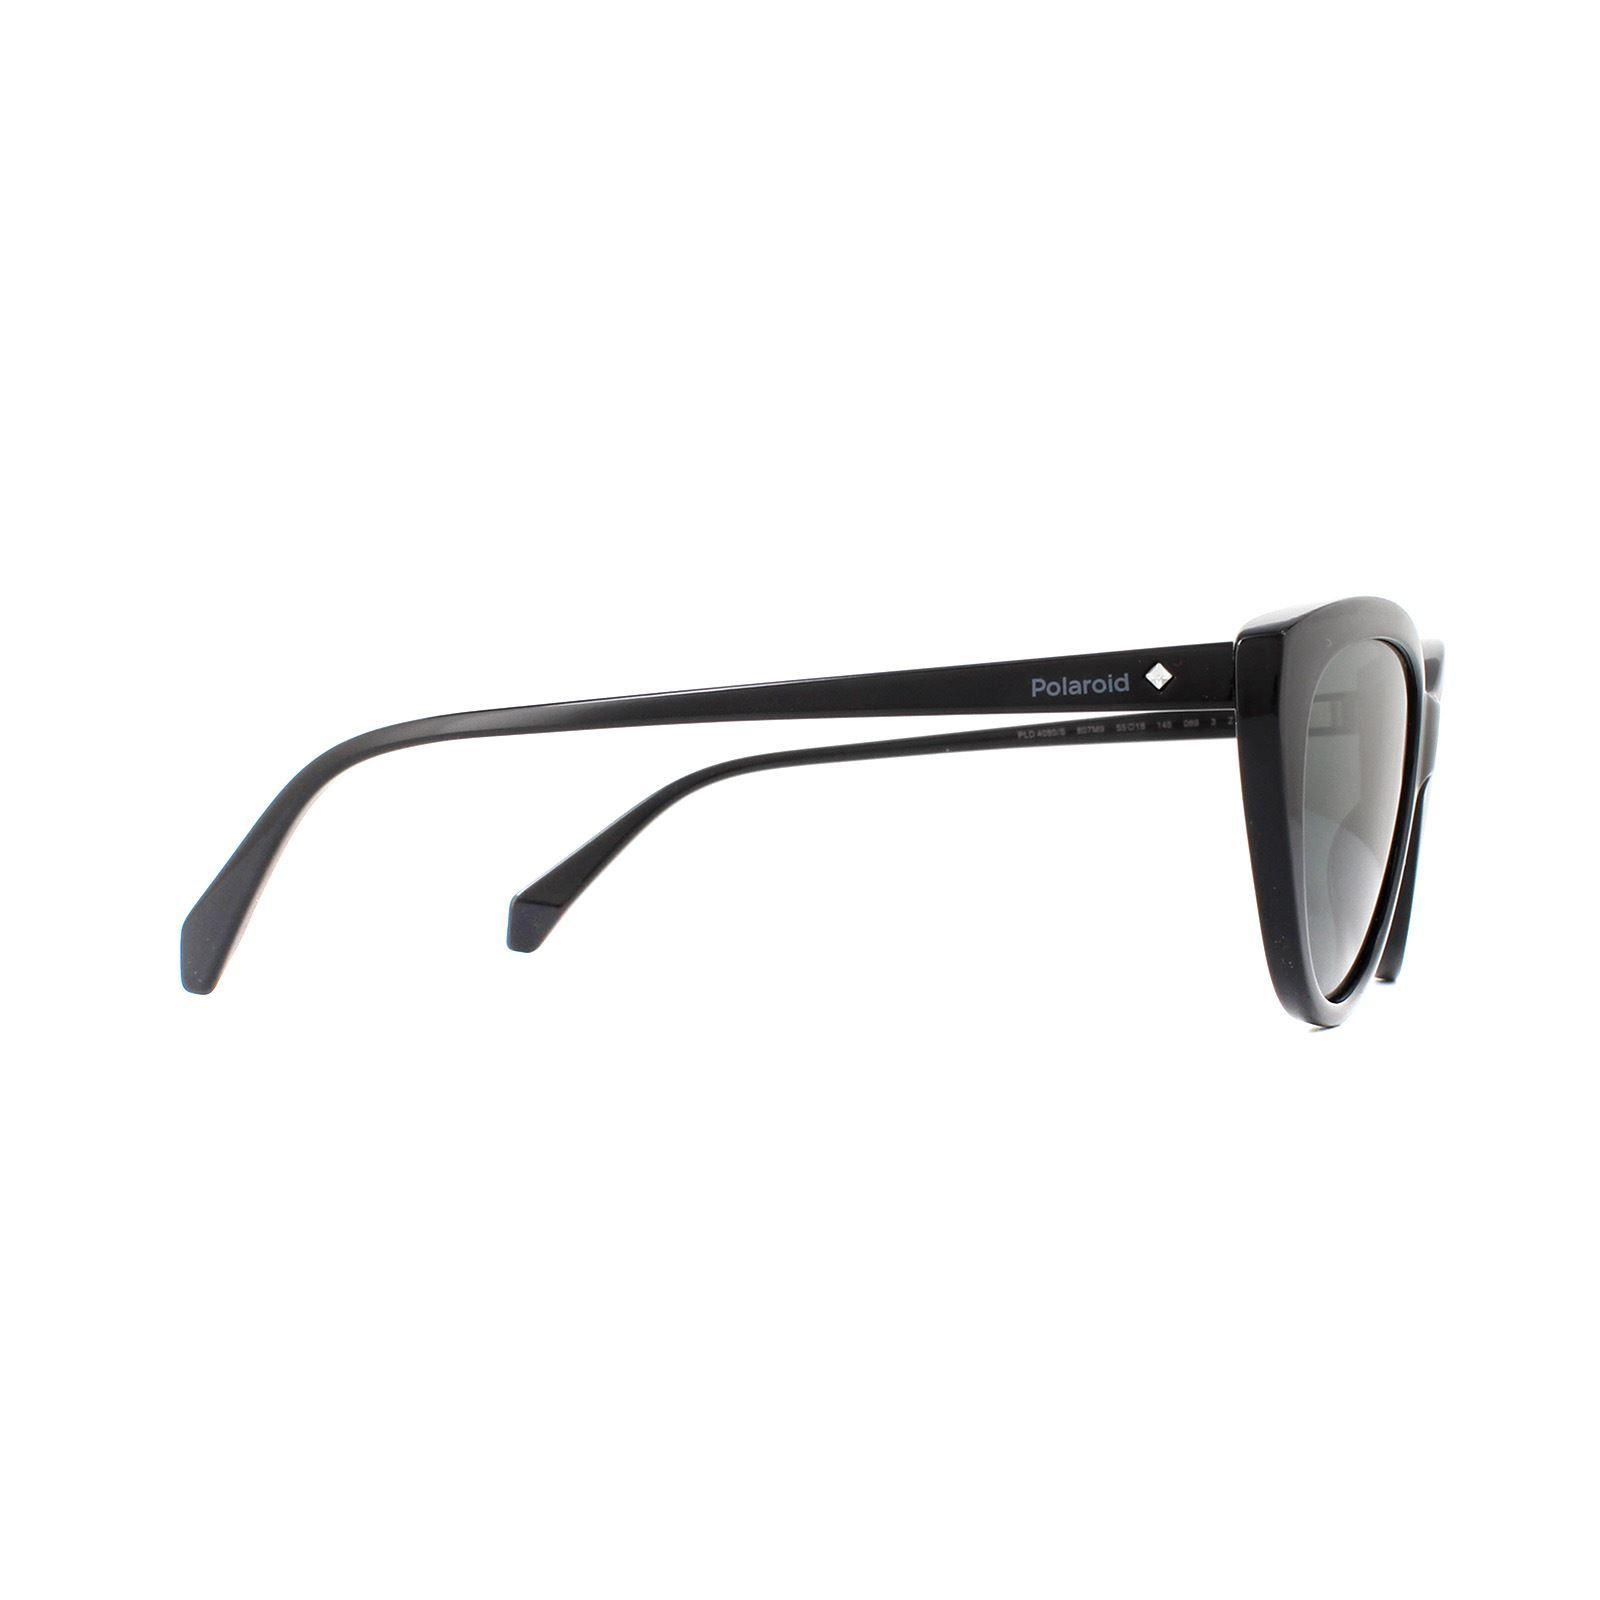 Polaroid Sunglasses PLD 4080/S 807 M9 Black Grey Polarized